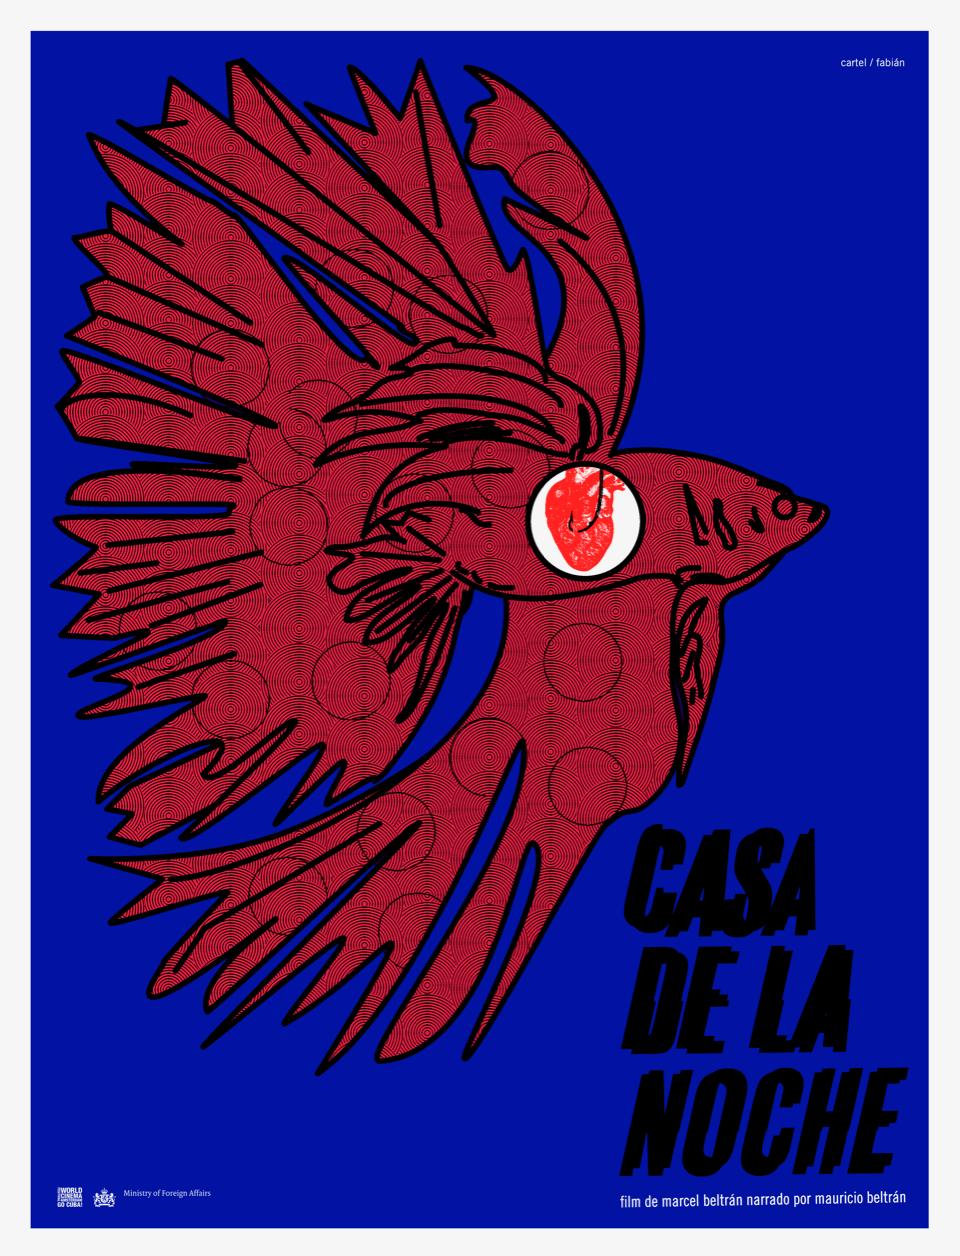 Casa de la noche (film poster) (1).jpg